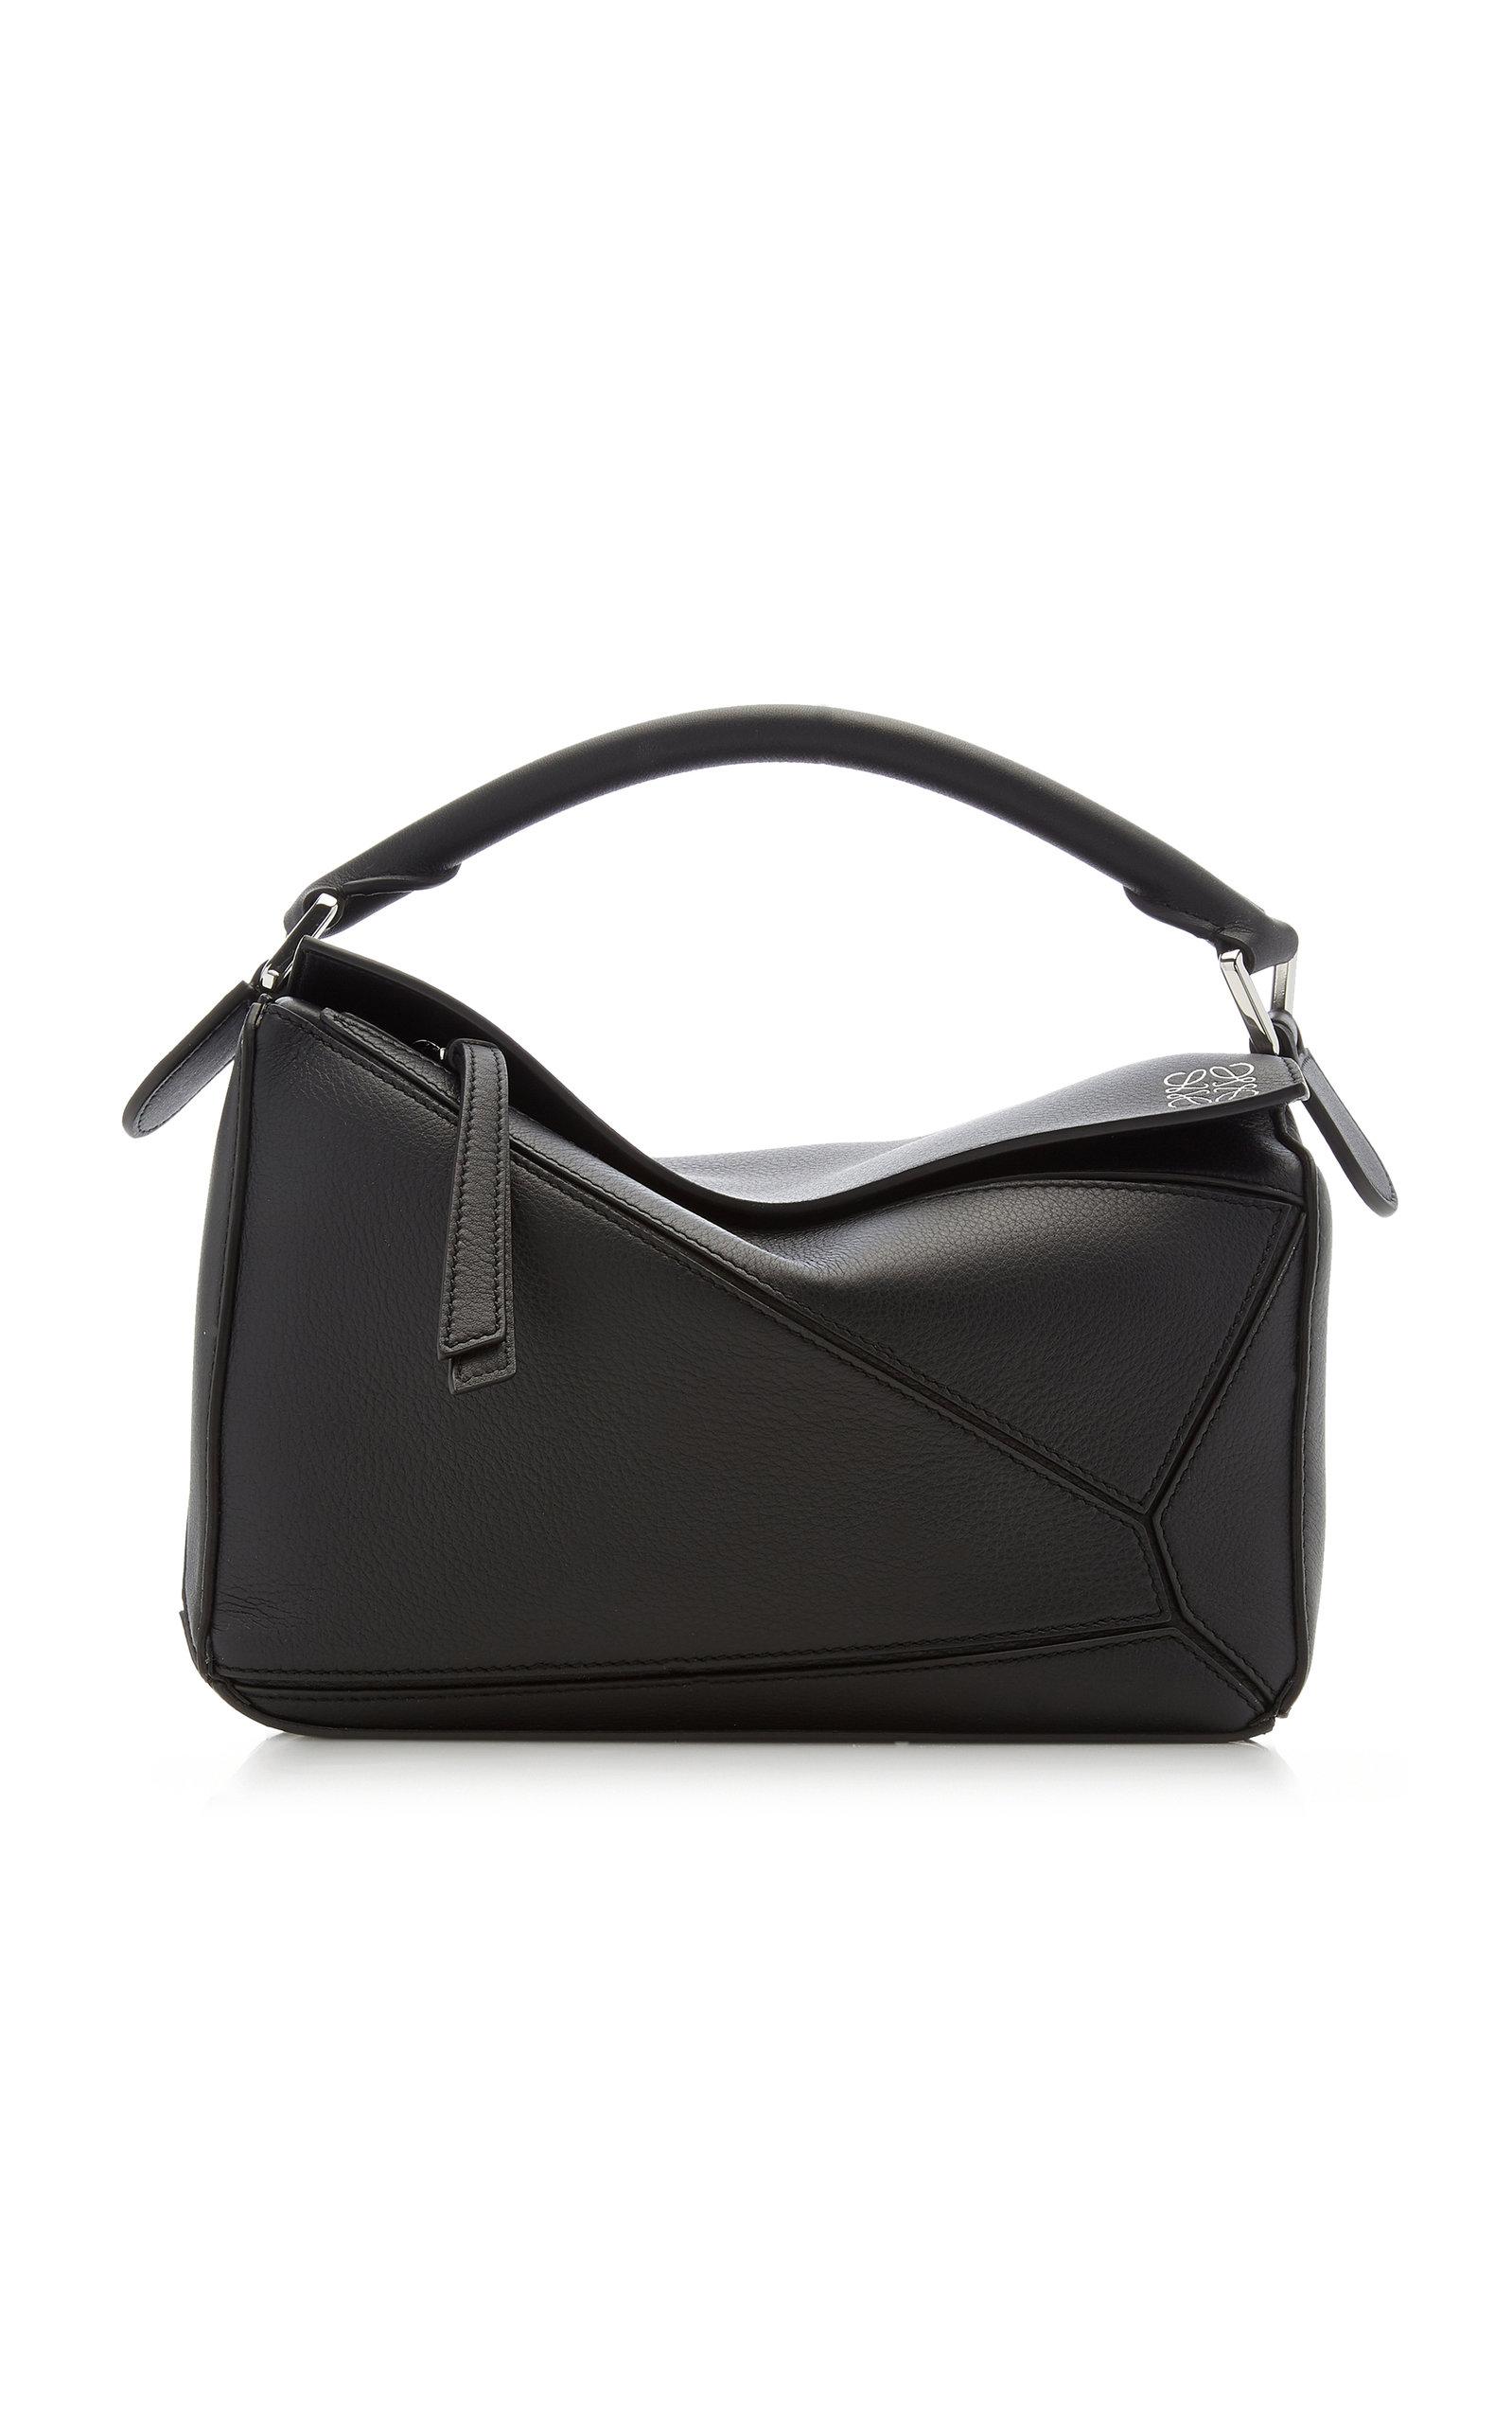 896e9beee2e7f Puzzle Small Leather Bag by Loewe | Moda Operandi